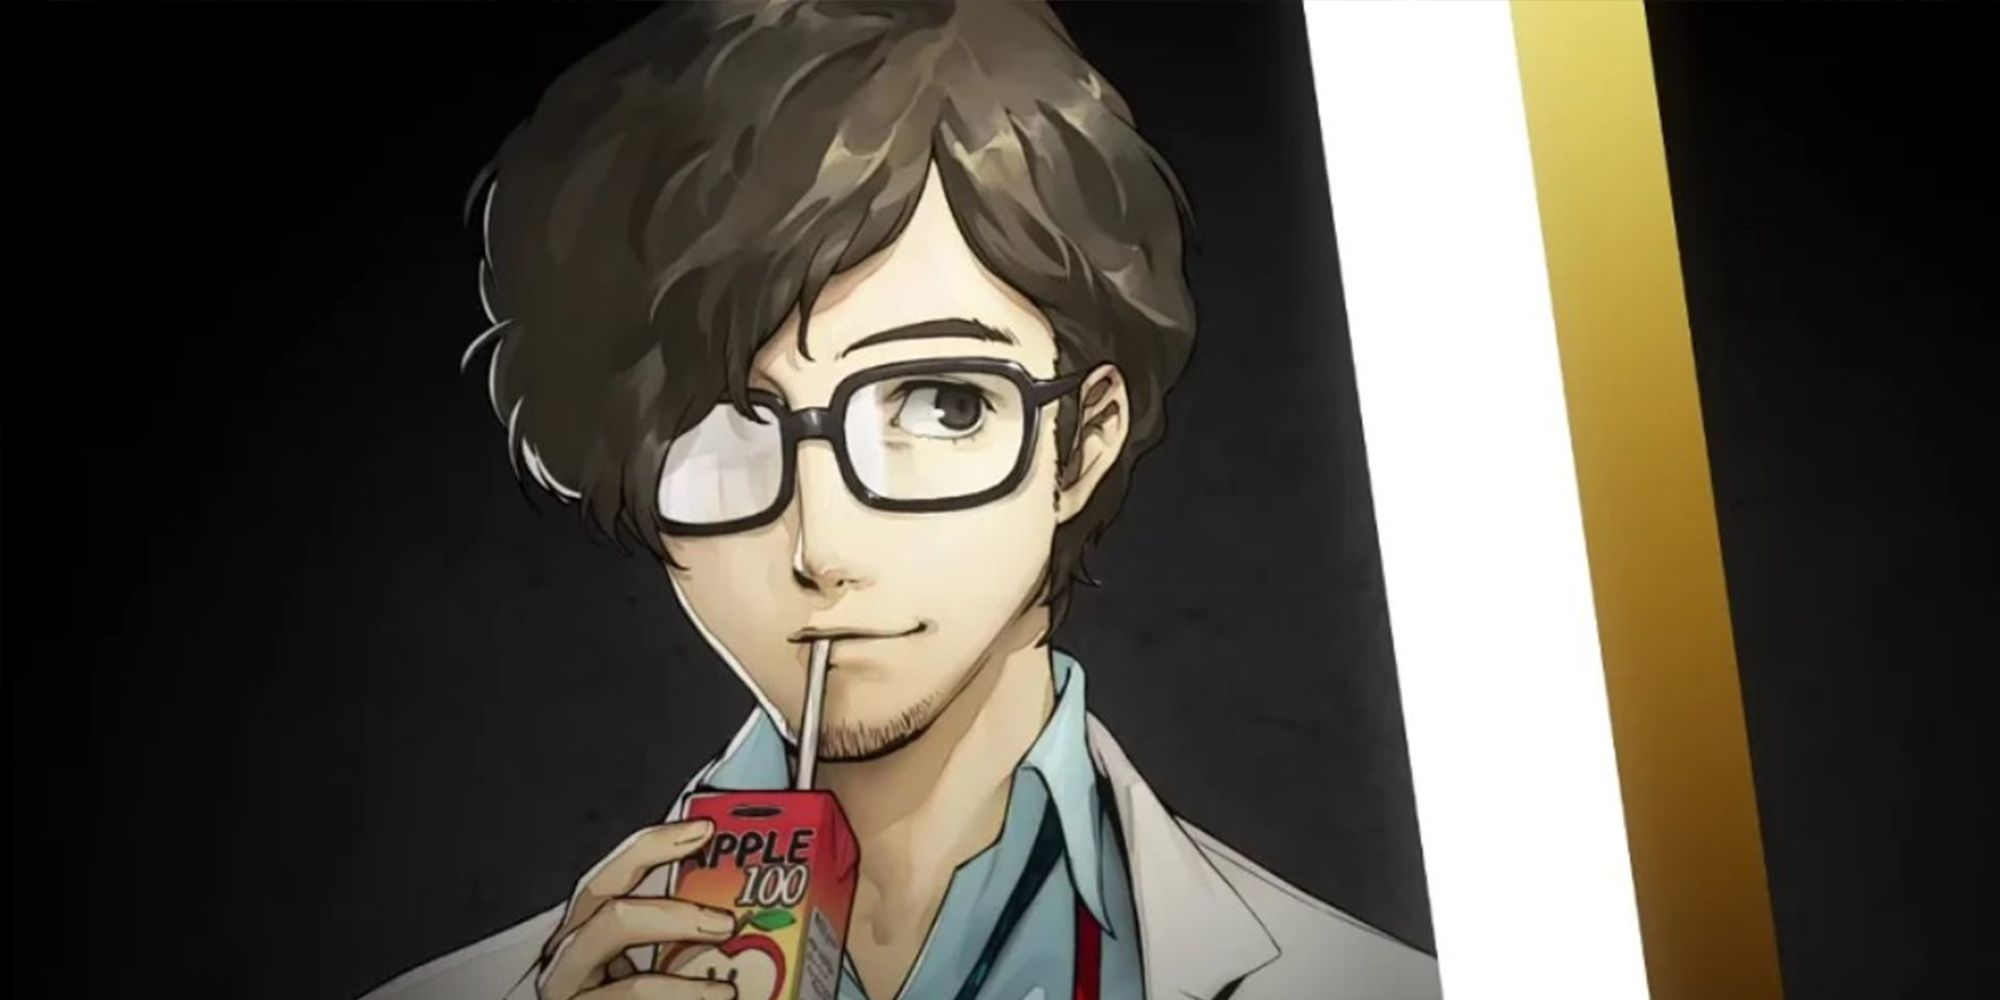 Persona 5 Royal Takuto Maruki Confidant Guide Perks Ranks